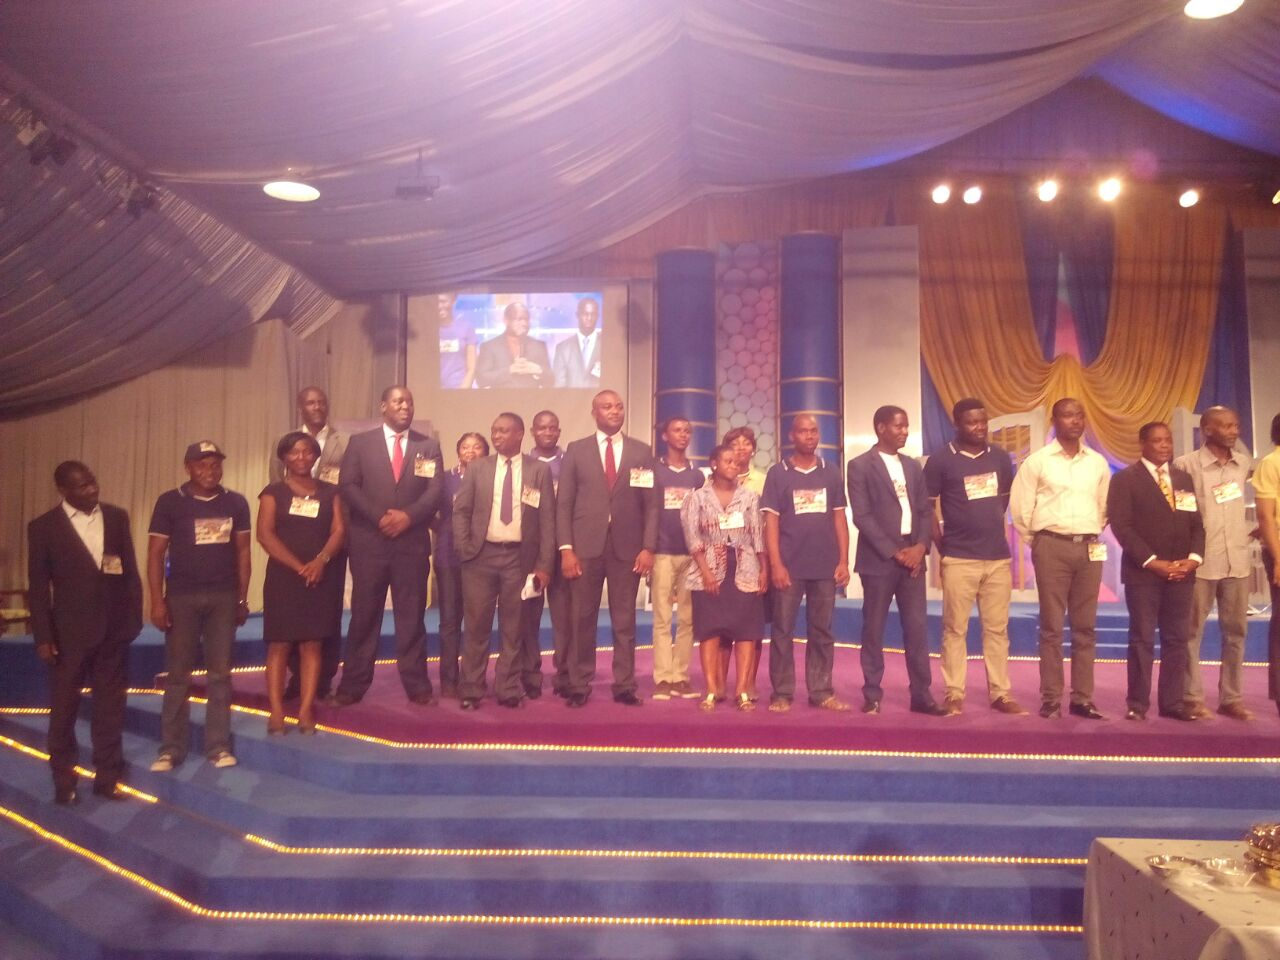 The compliant Brethren #@NOBSLRALLYISOLO# #CELAGZO